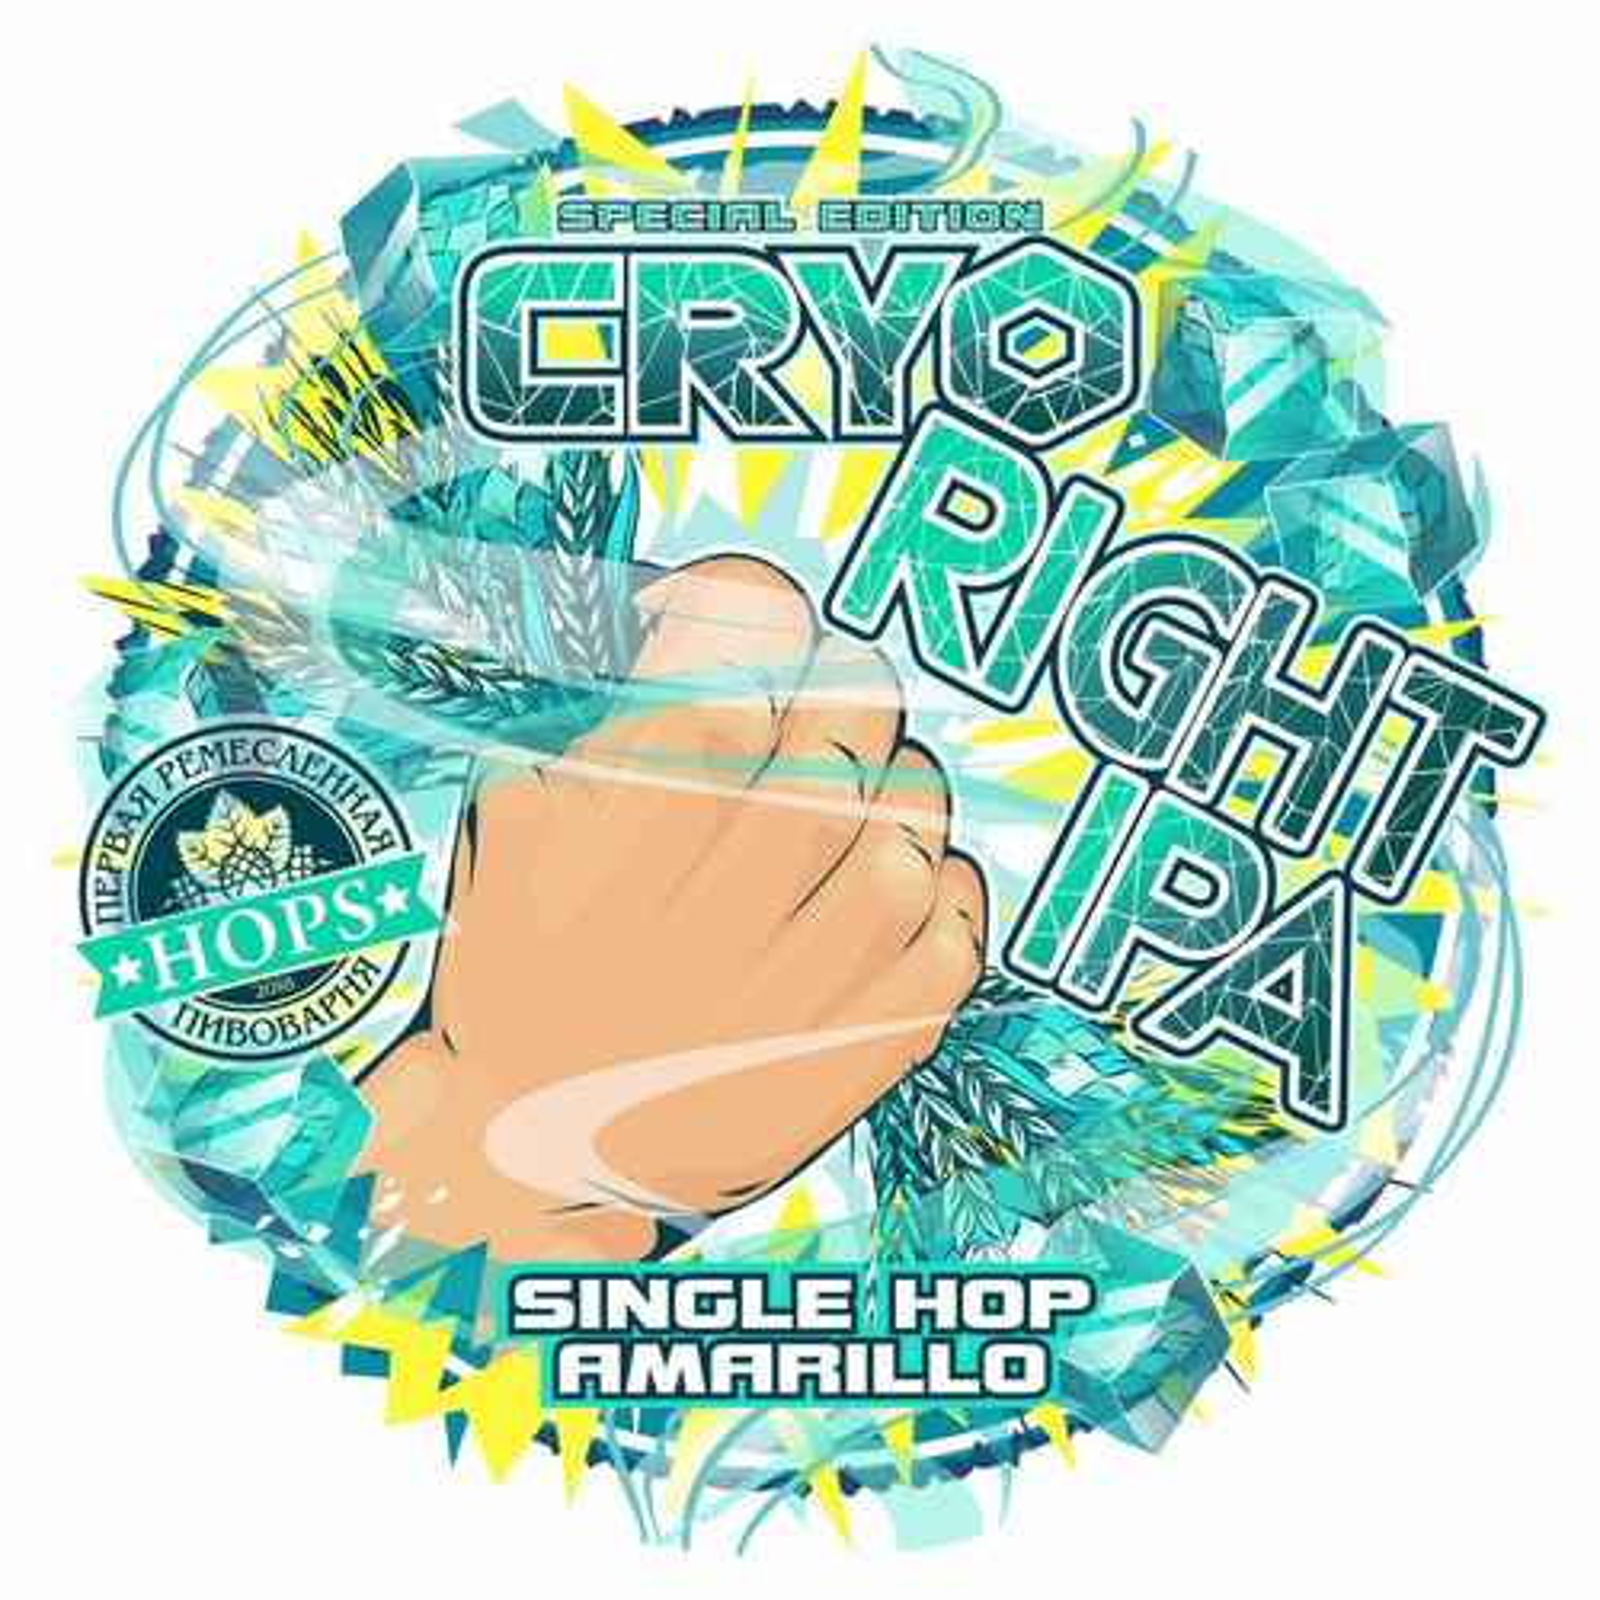 Пиво Cryo IPA. Single Hop Amarillo